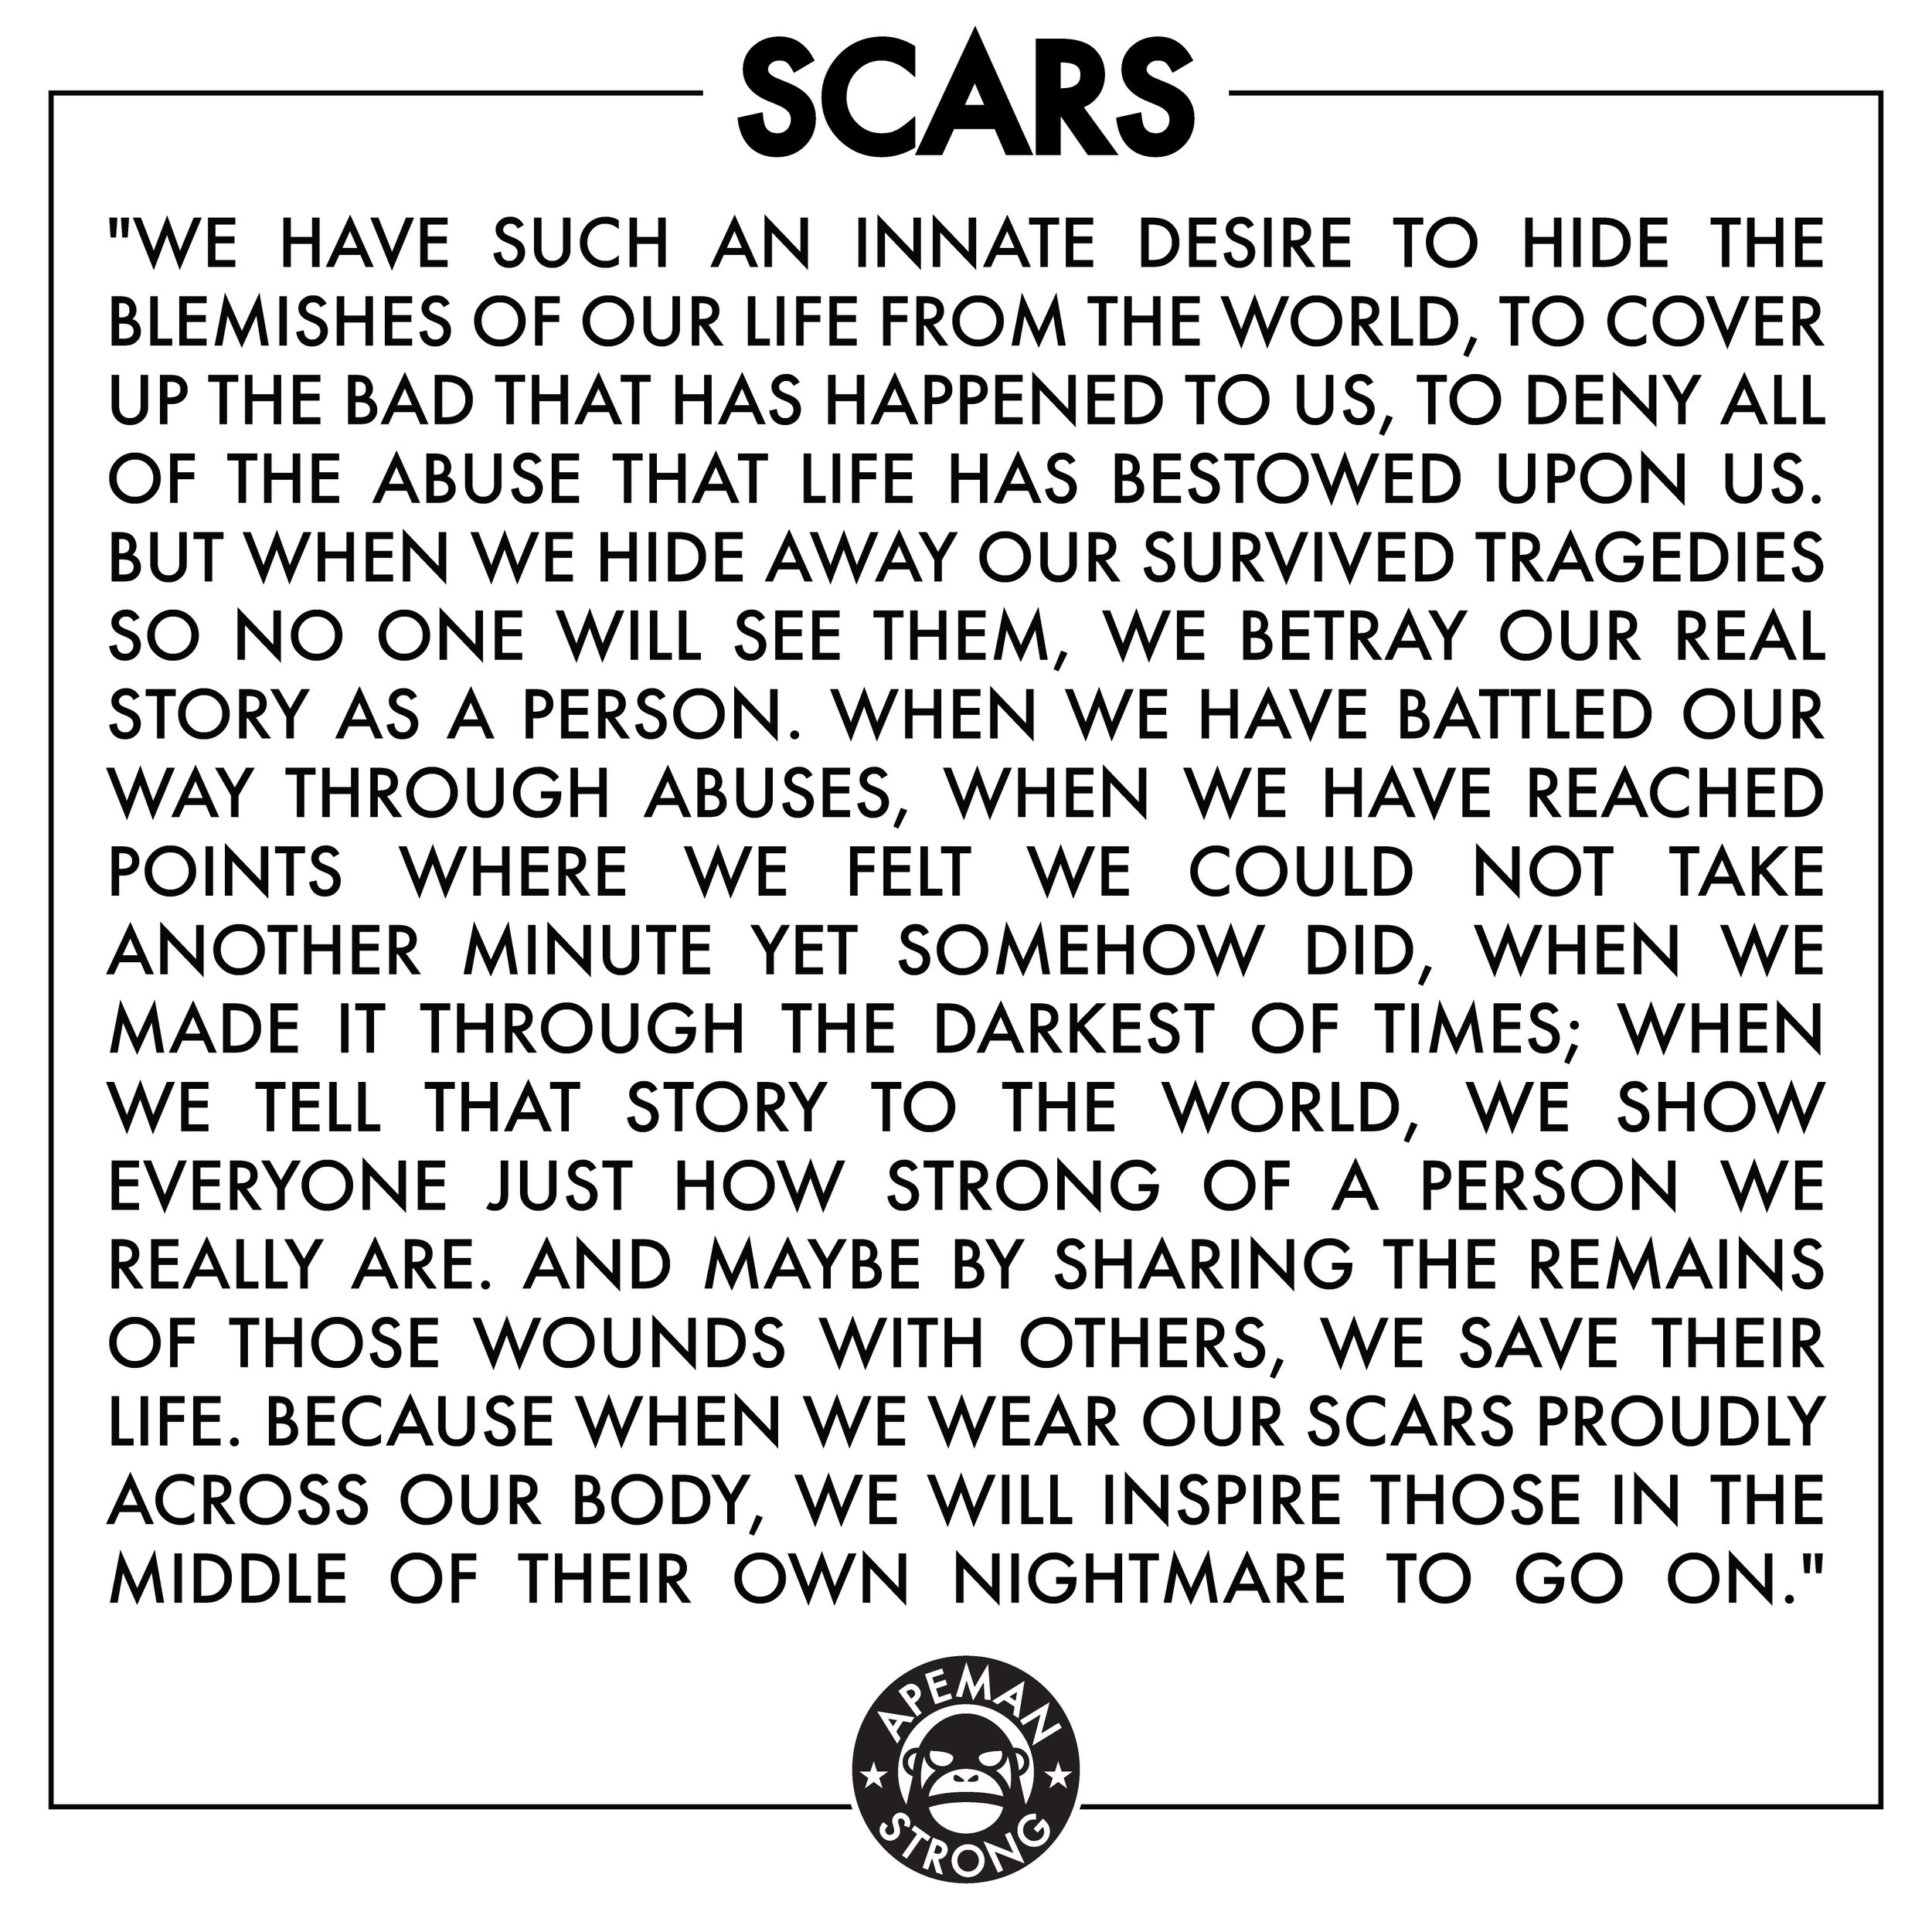 SCARS.jpeg